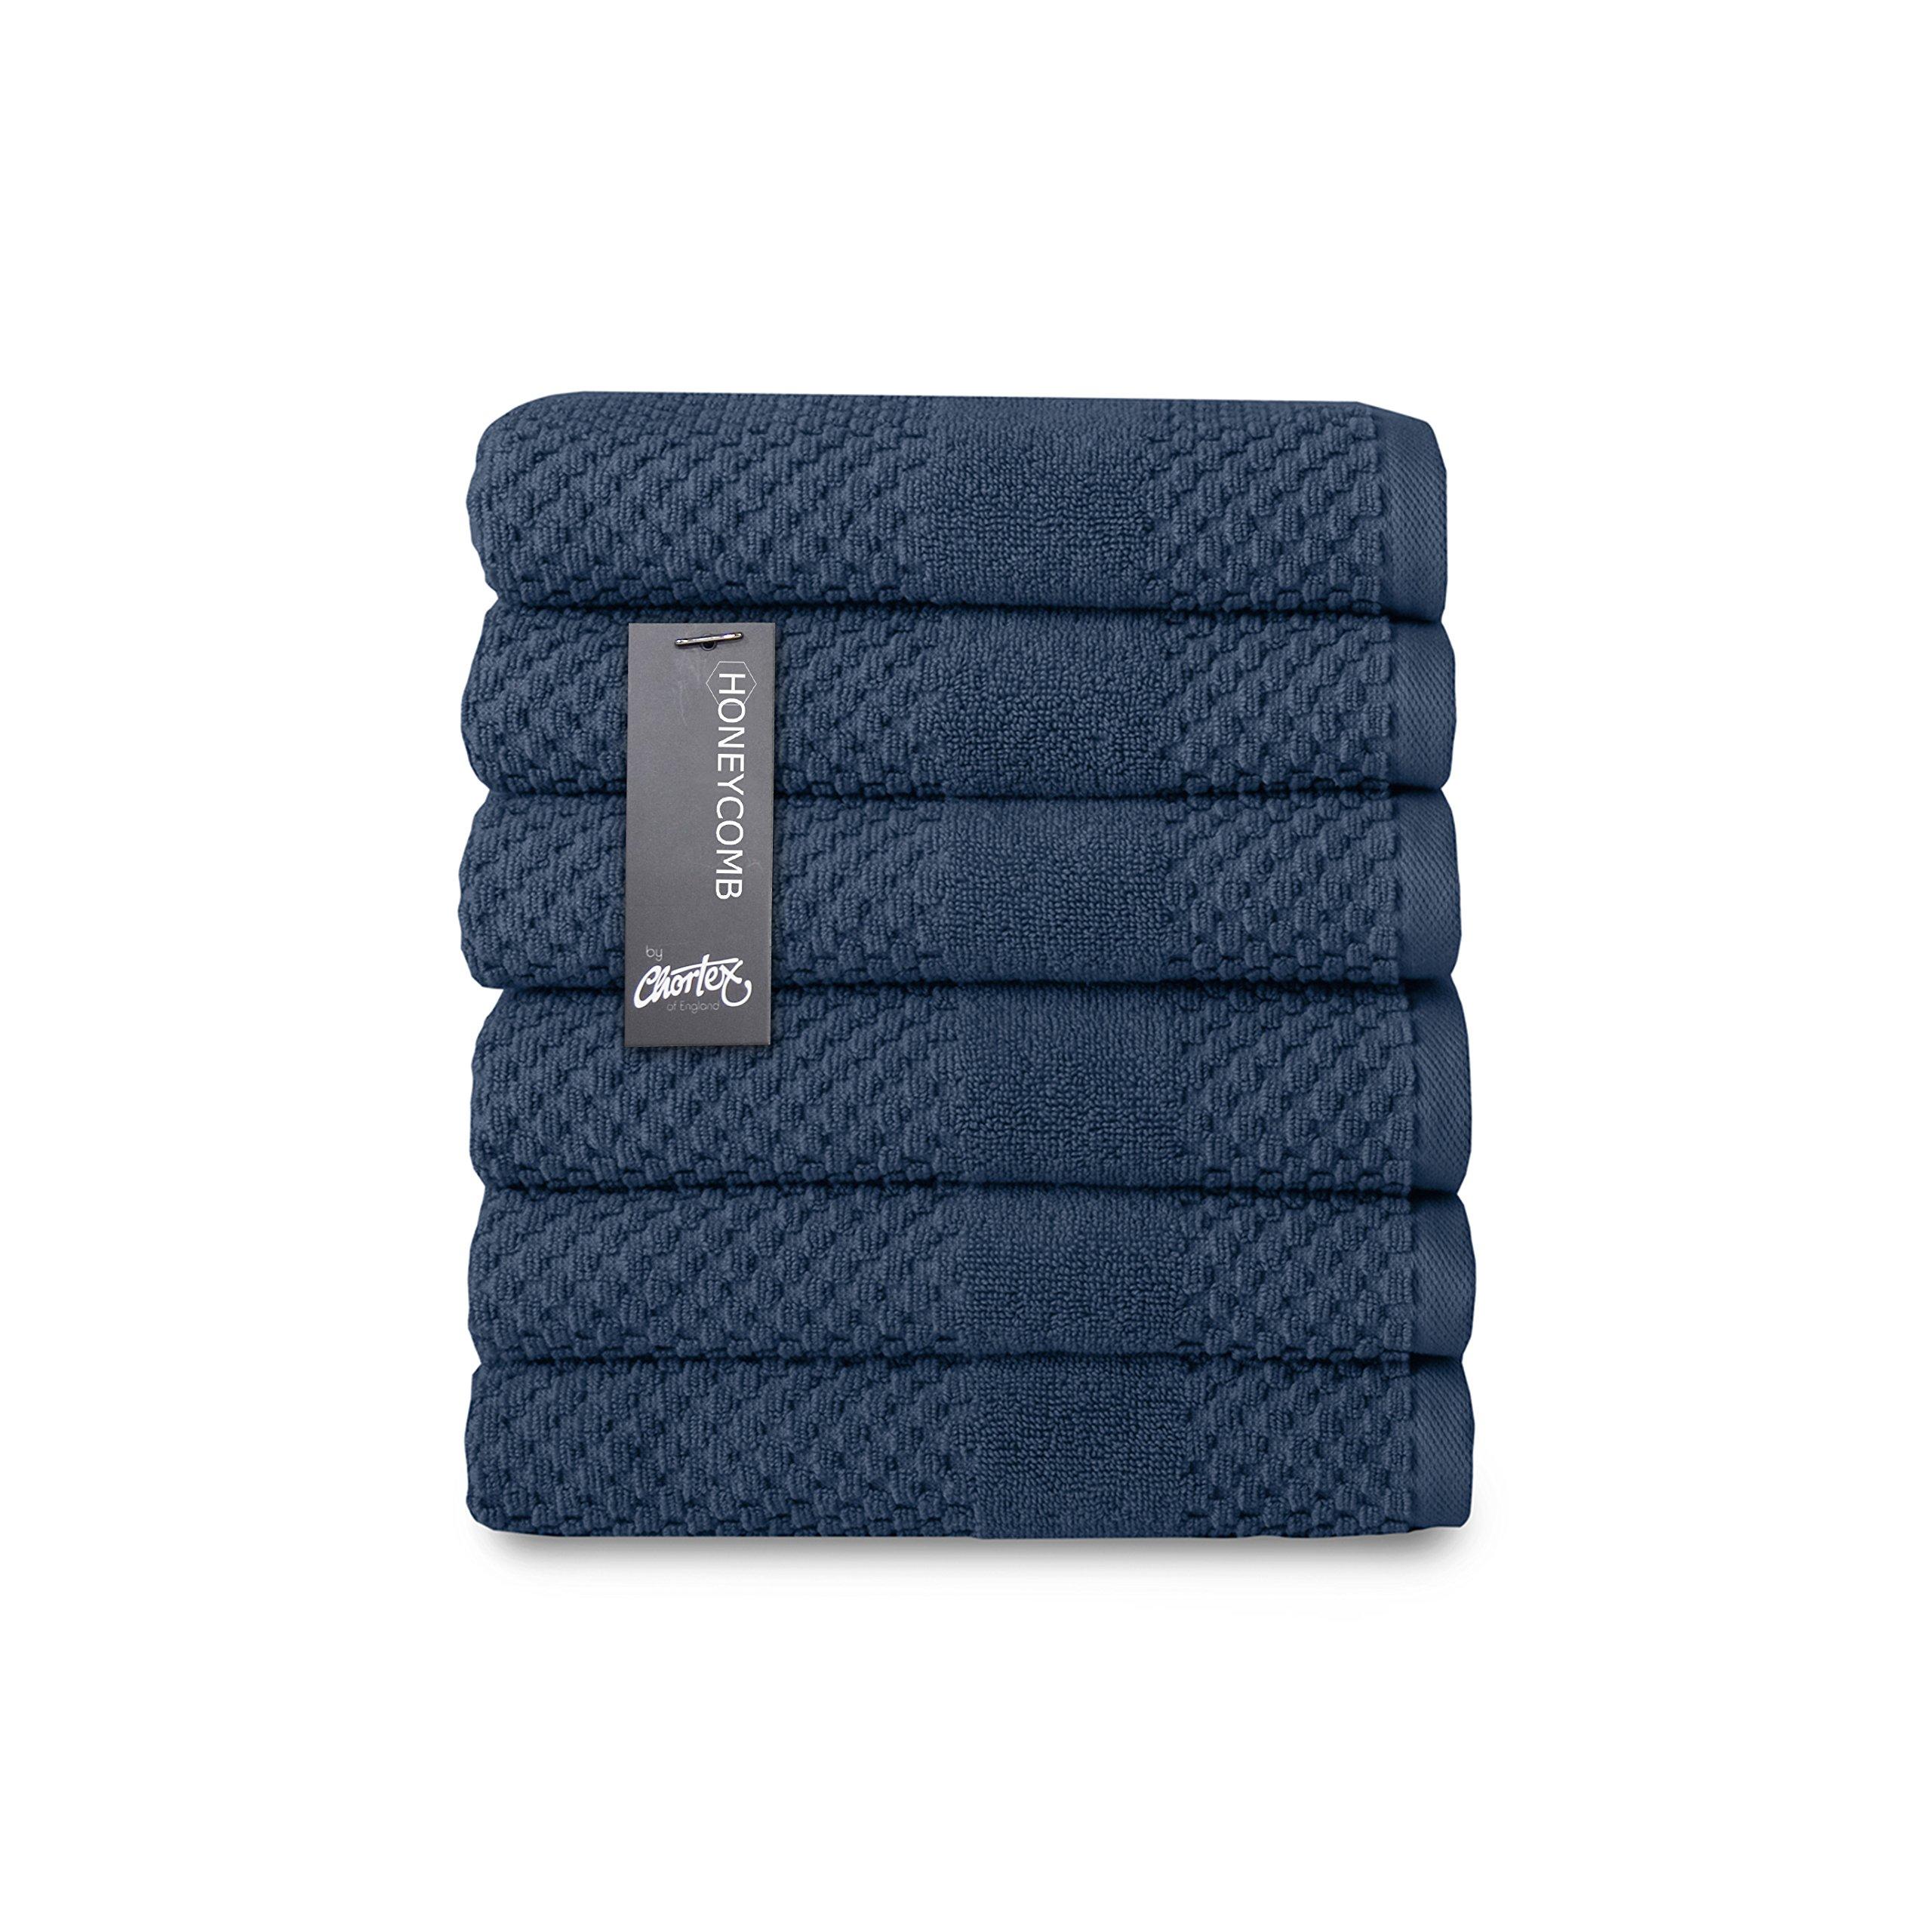 Chortex Turkish Cotton Hand Towel (6 Pack), Pack of 6, Navy